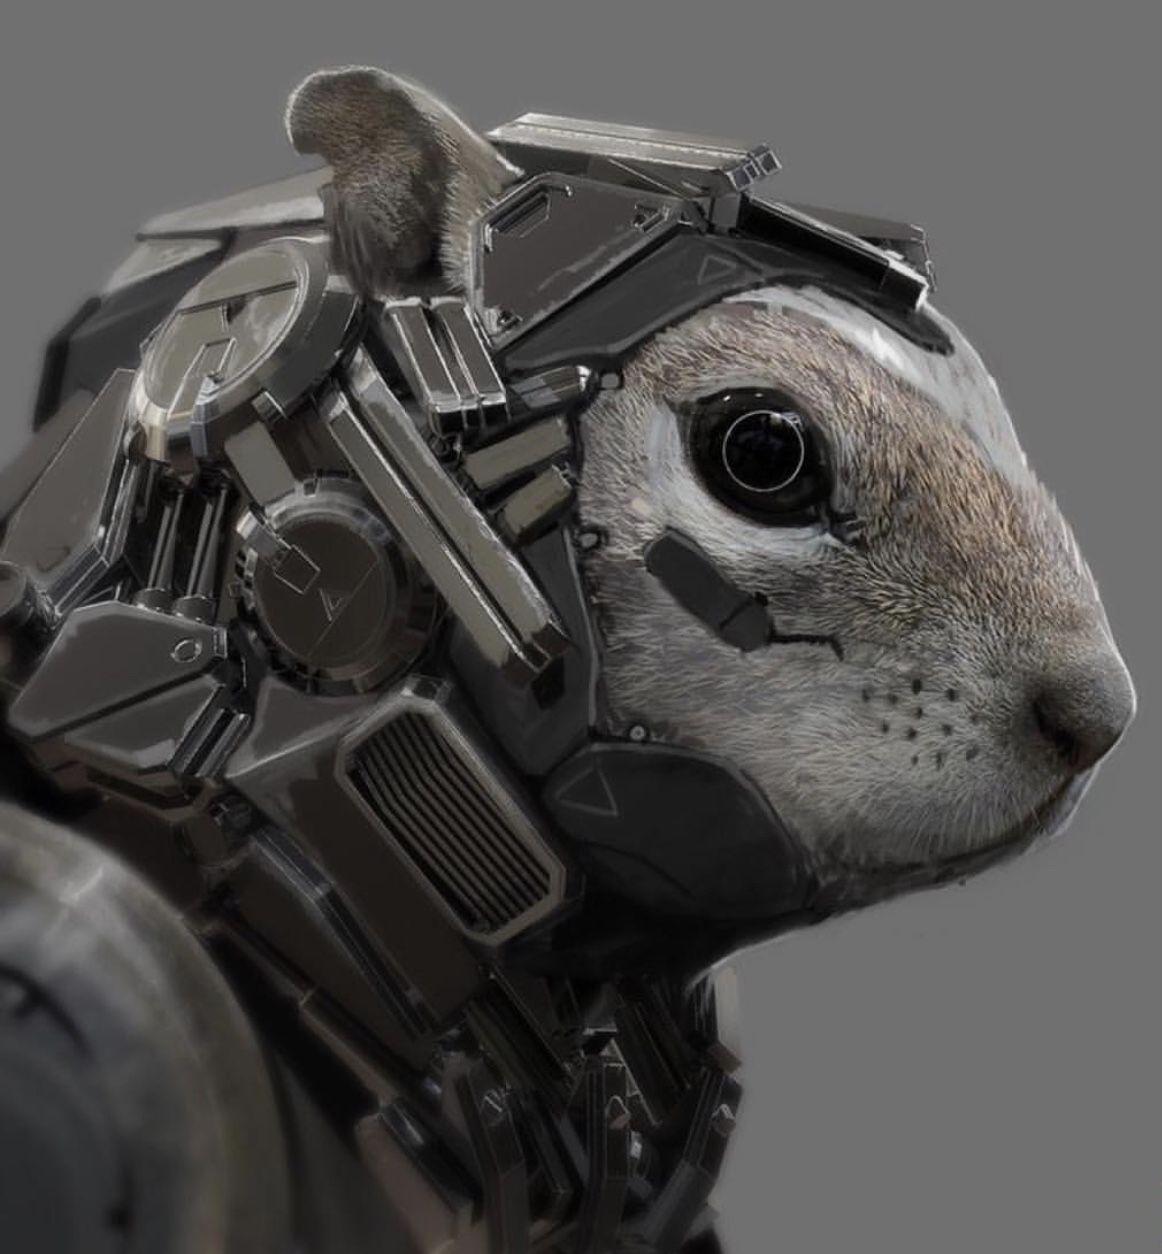 Robot Biomechanical Art In 2019 Robot Design Robot Animal